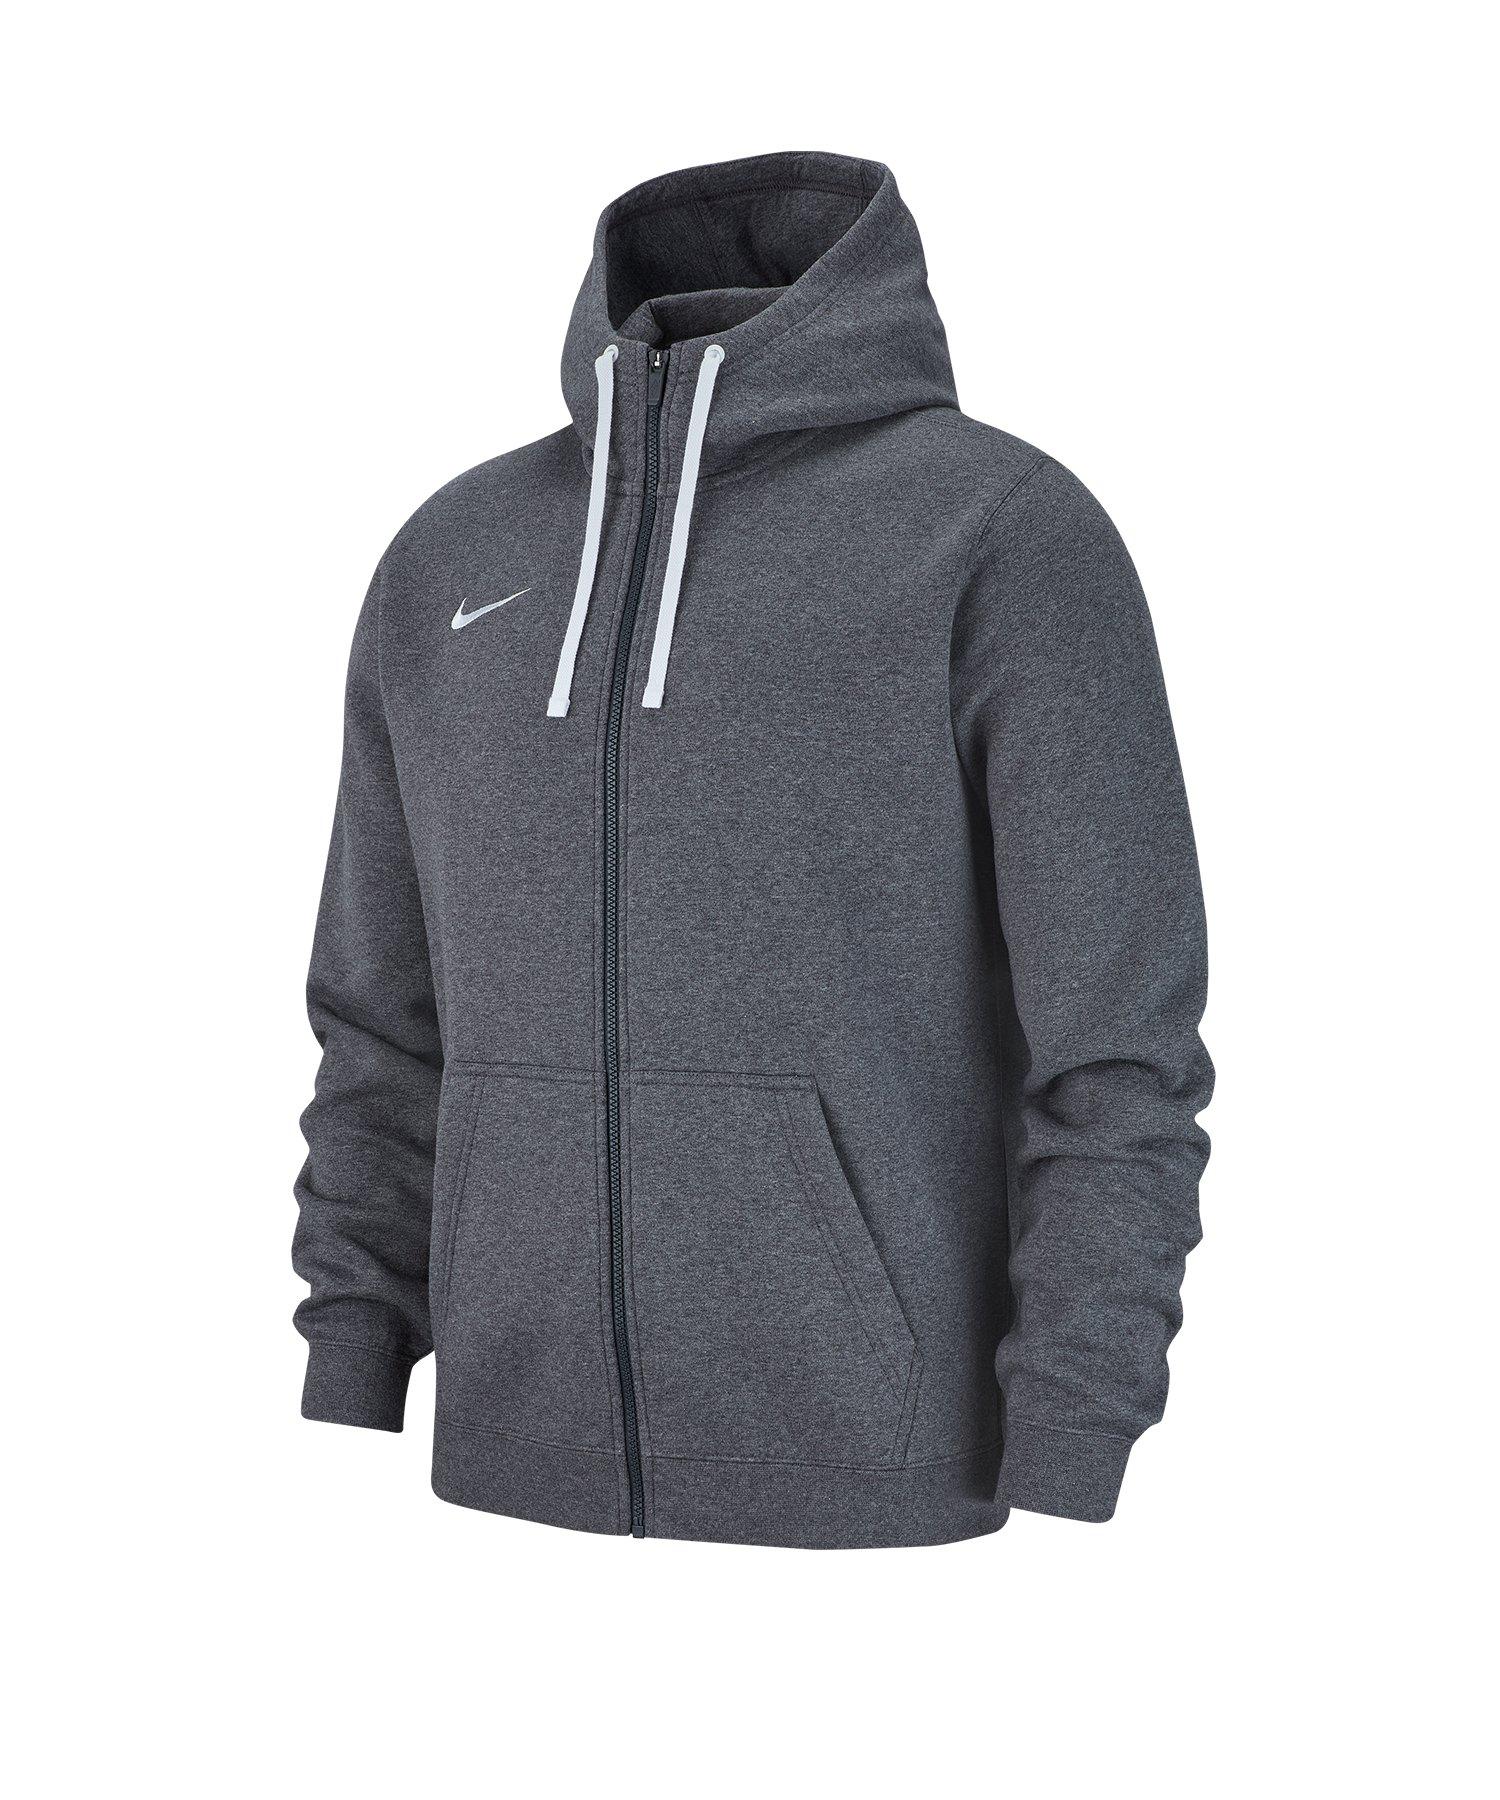 Nike Club 19 Fleece Kapuzenjacke Grau F071